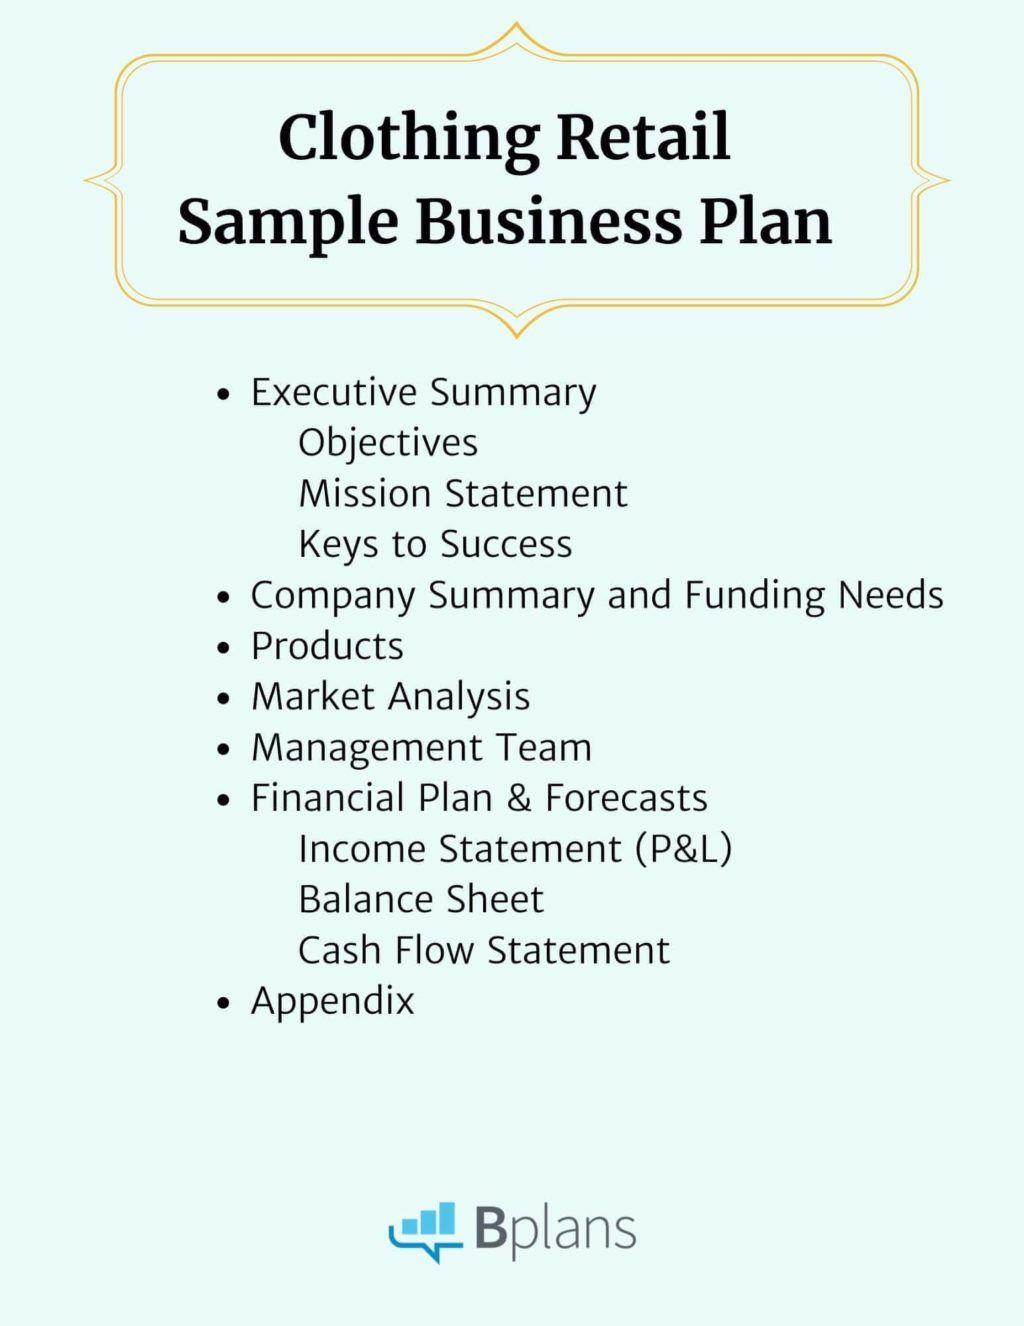 Clothing Retail Sample Business Plan Bplans pertaining